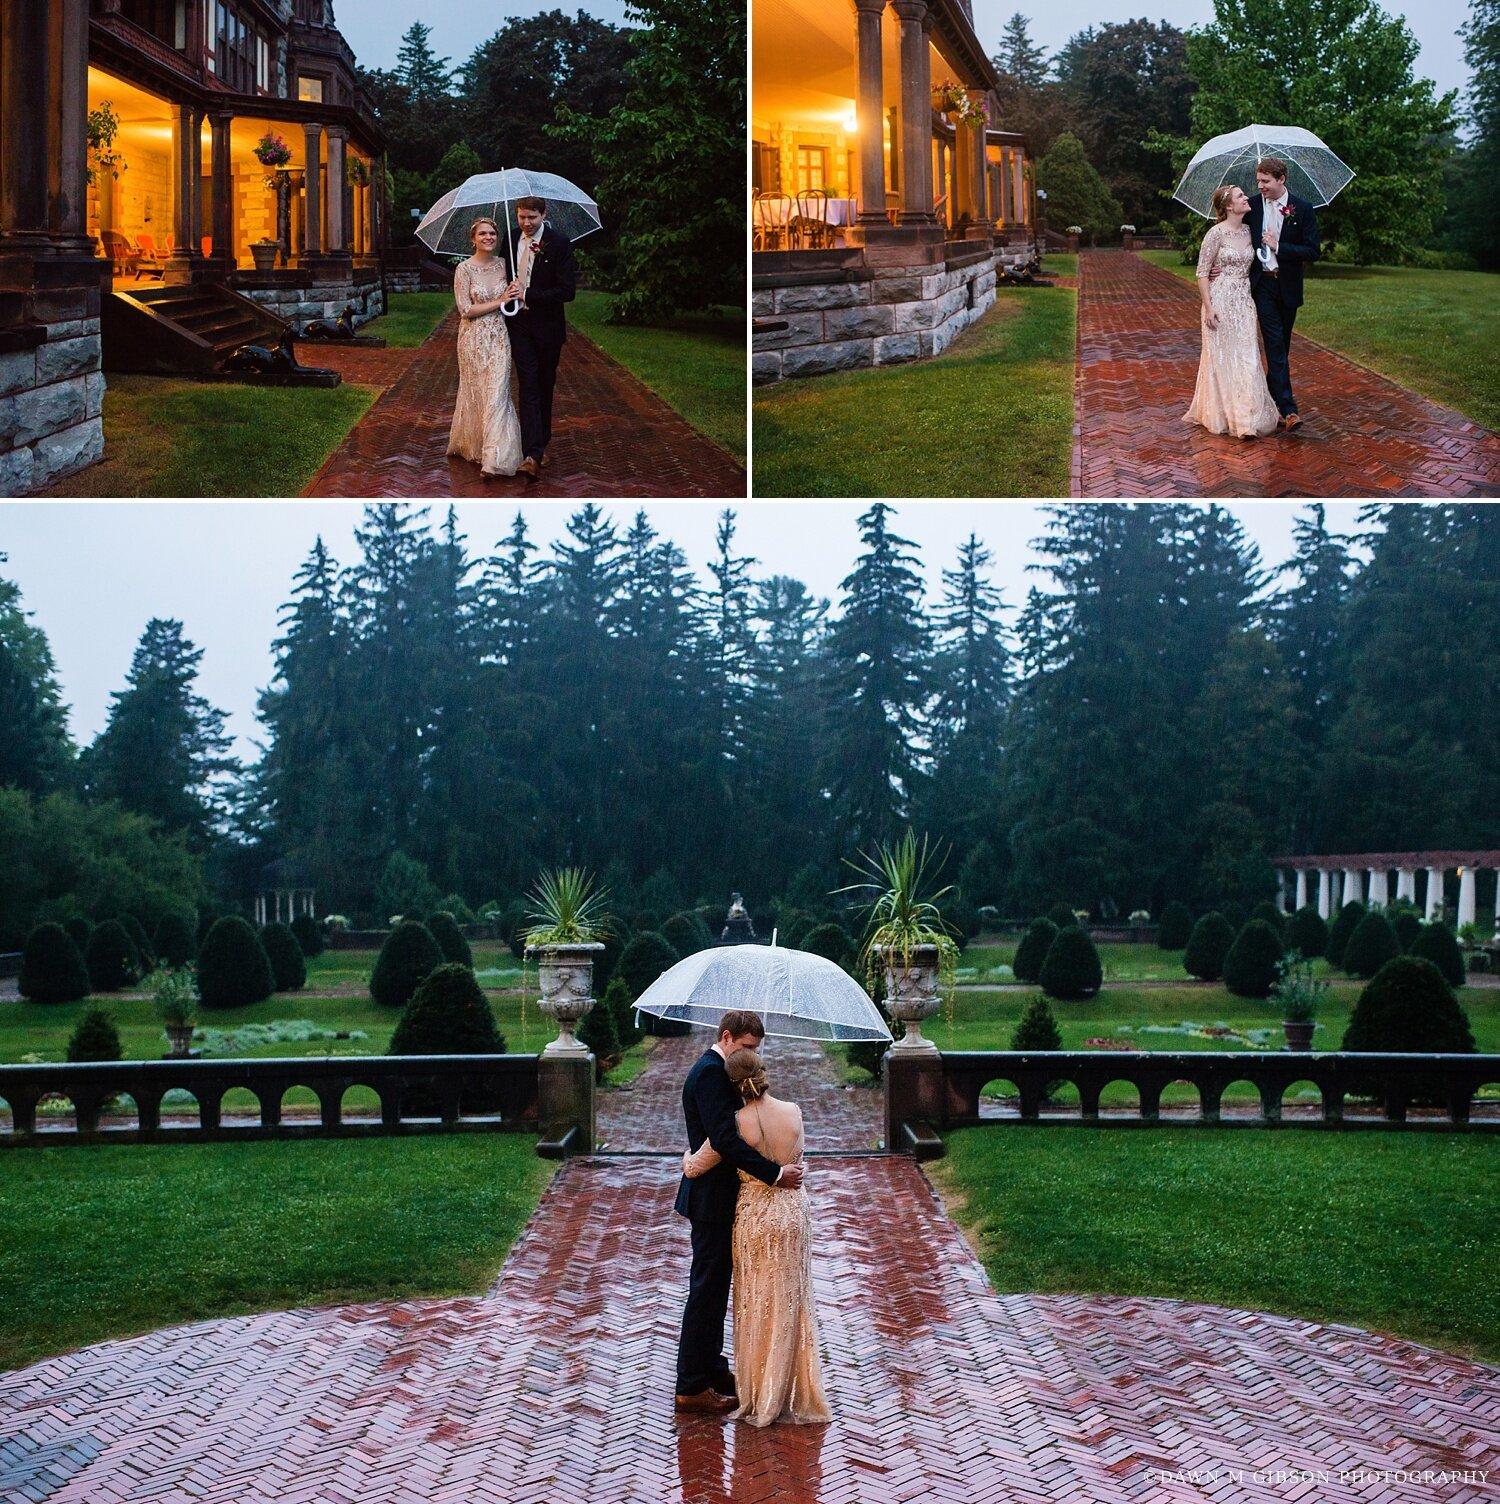 finger-lakes-newyork-wedding-photographer-sonnenberg-gardens-wedding-gold-wedding-dress-jenna-daniel_0068.jpg